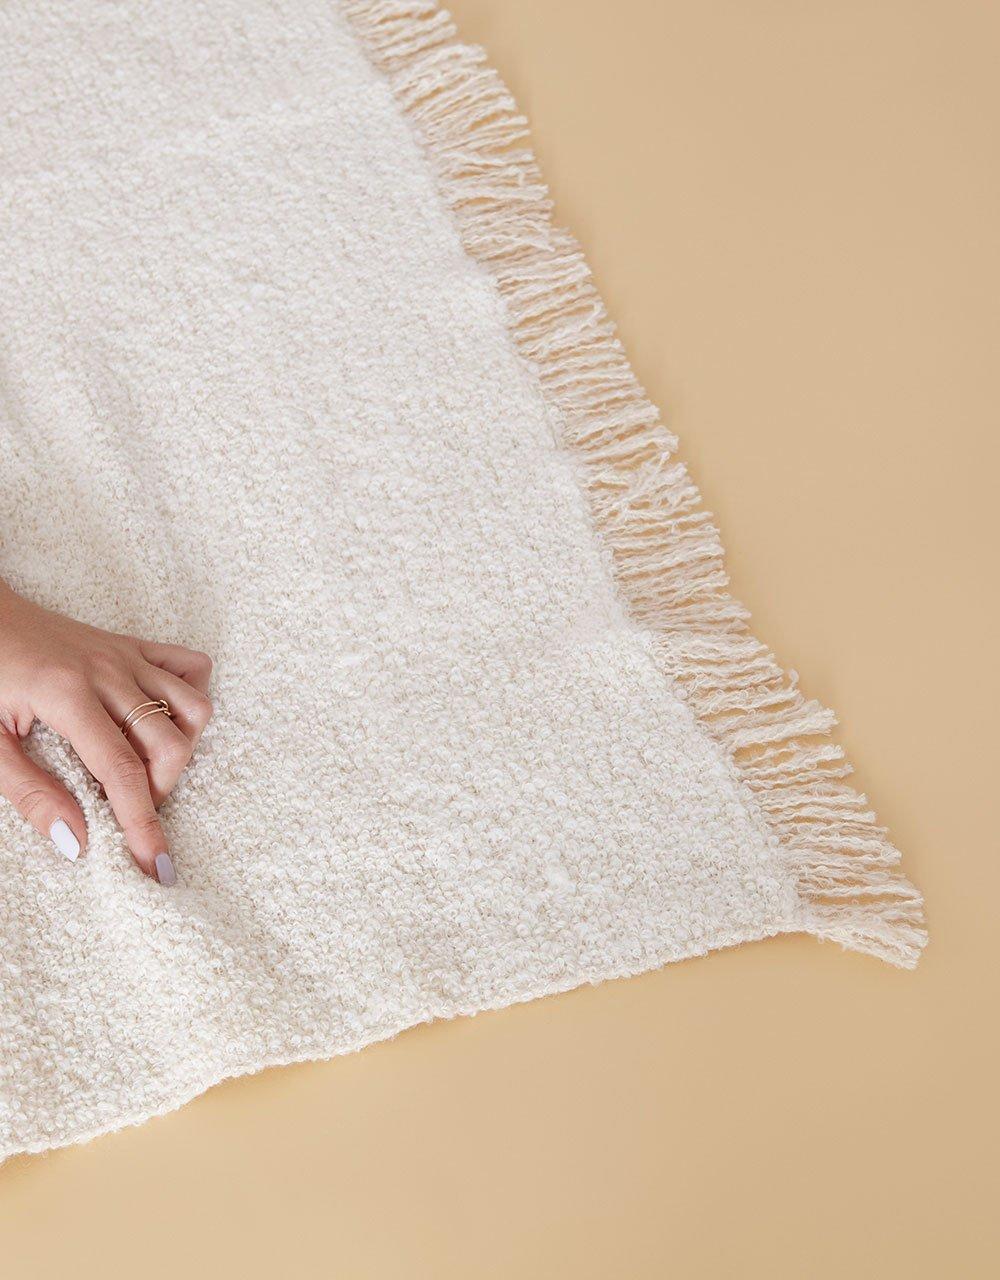 blanket09c